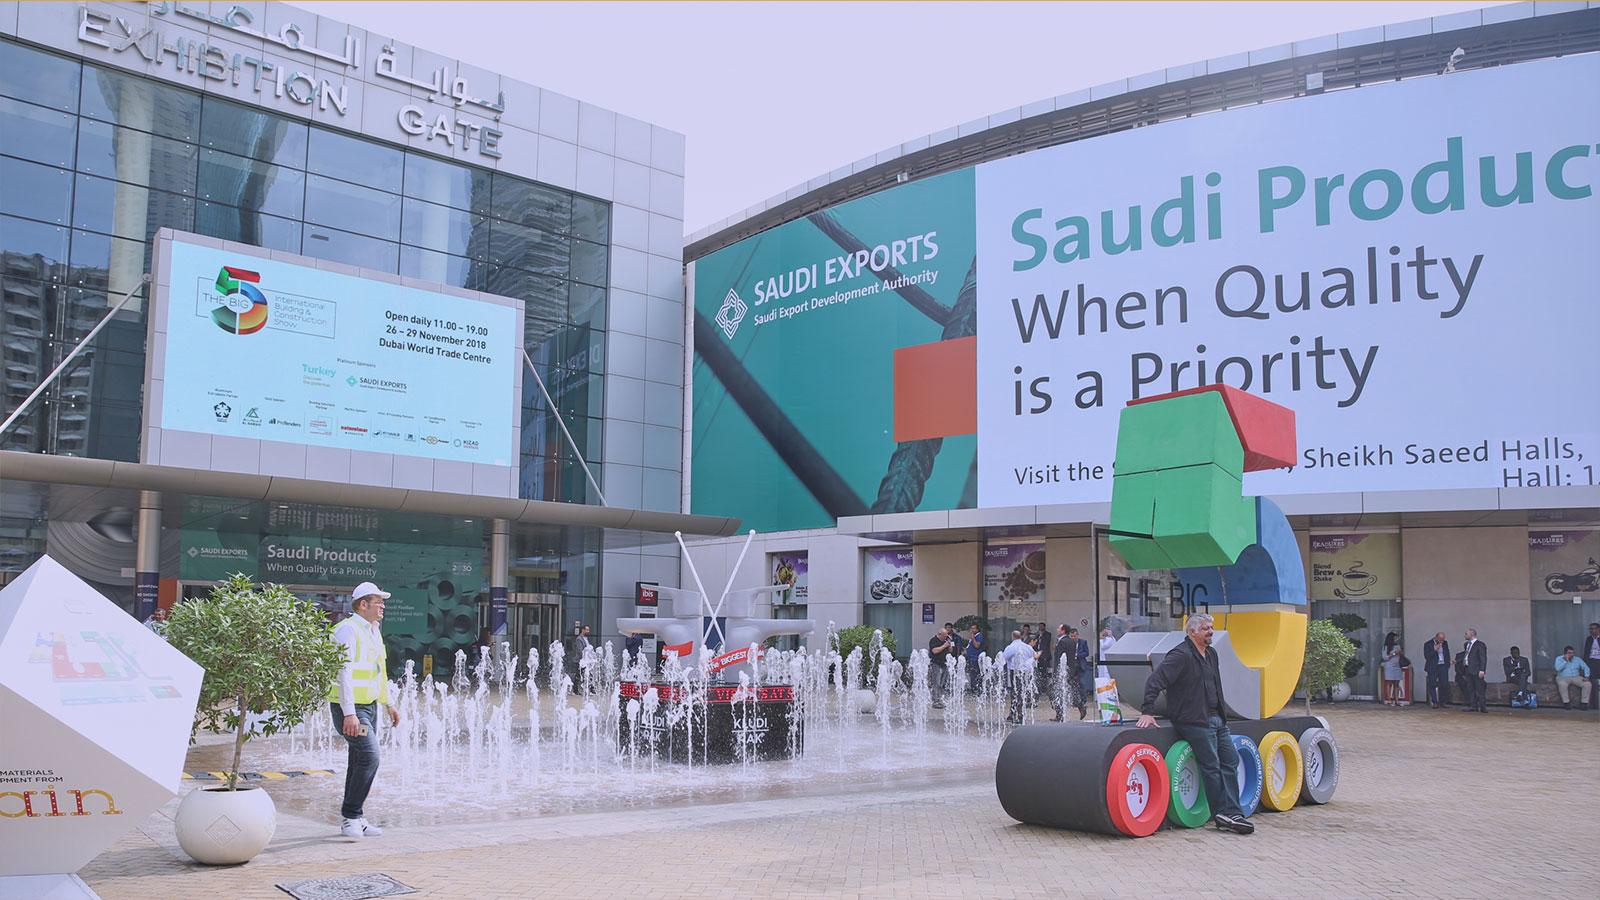 The Big 5 Dubai U.A.E. – 2018